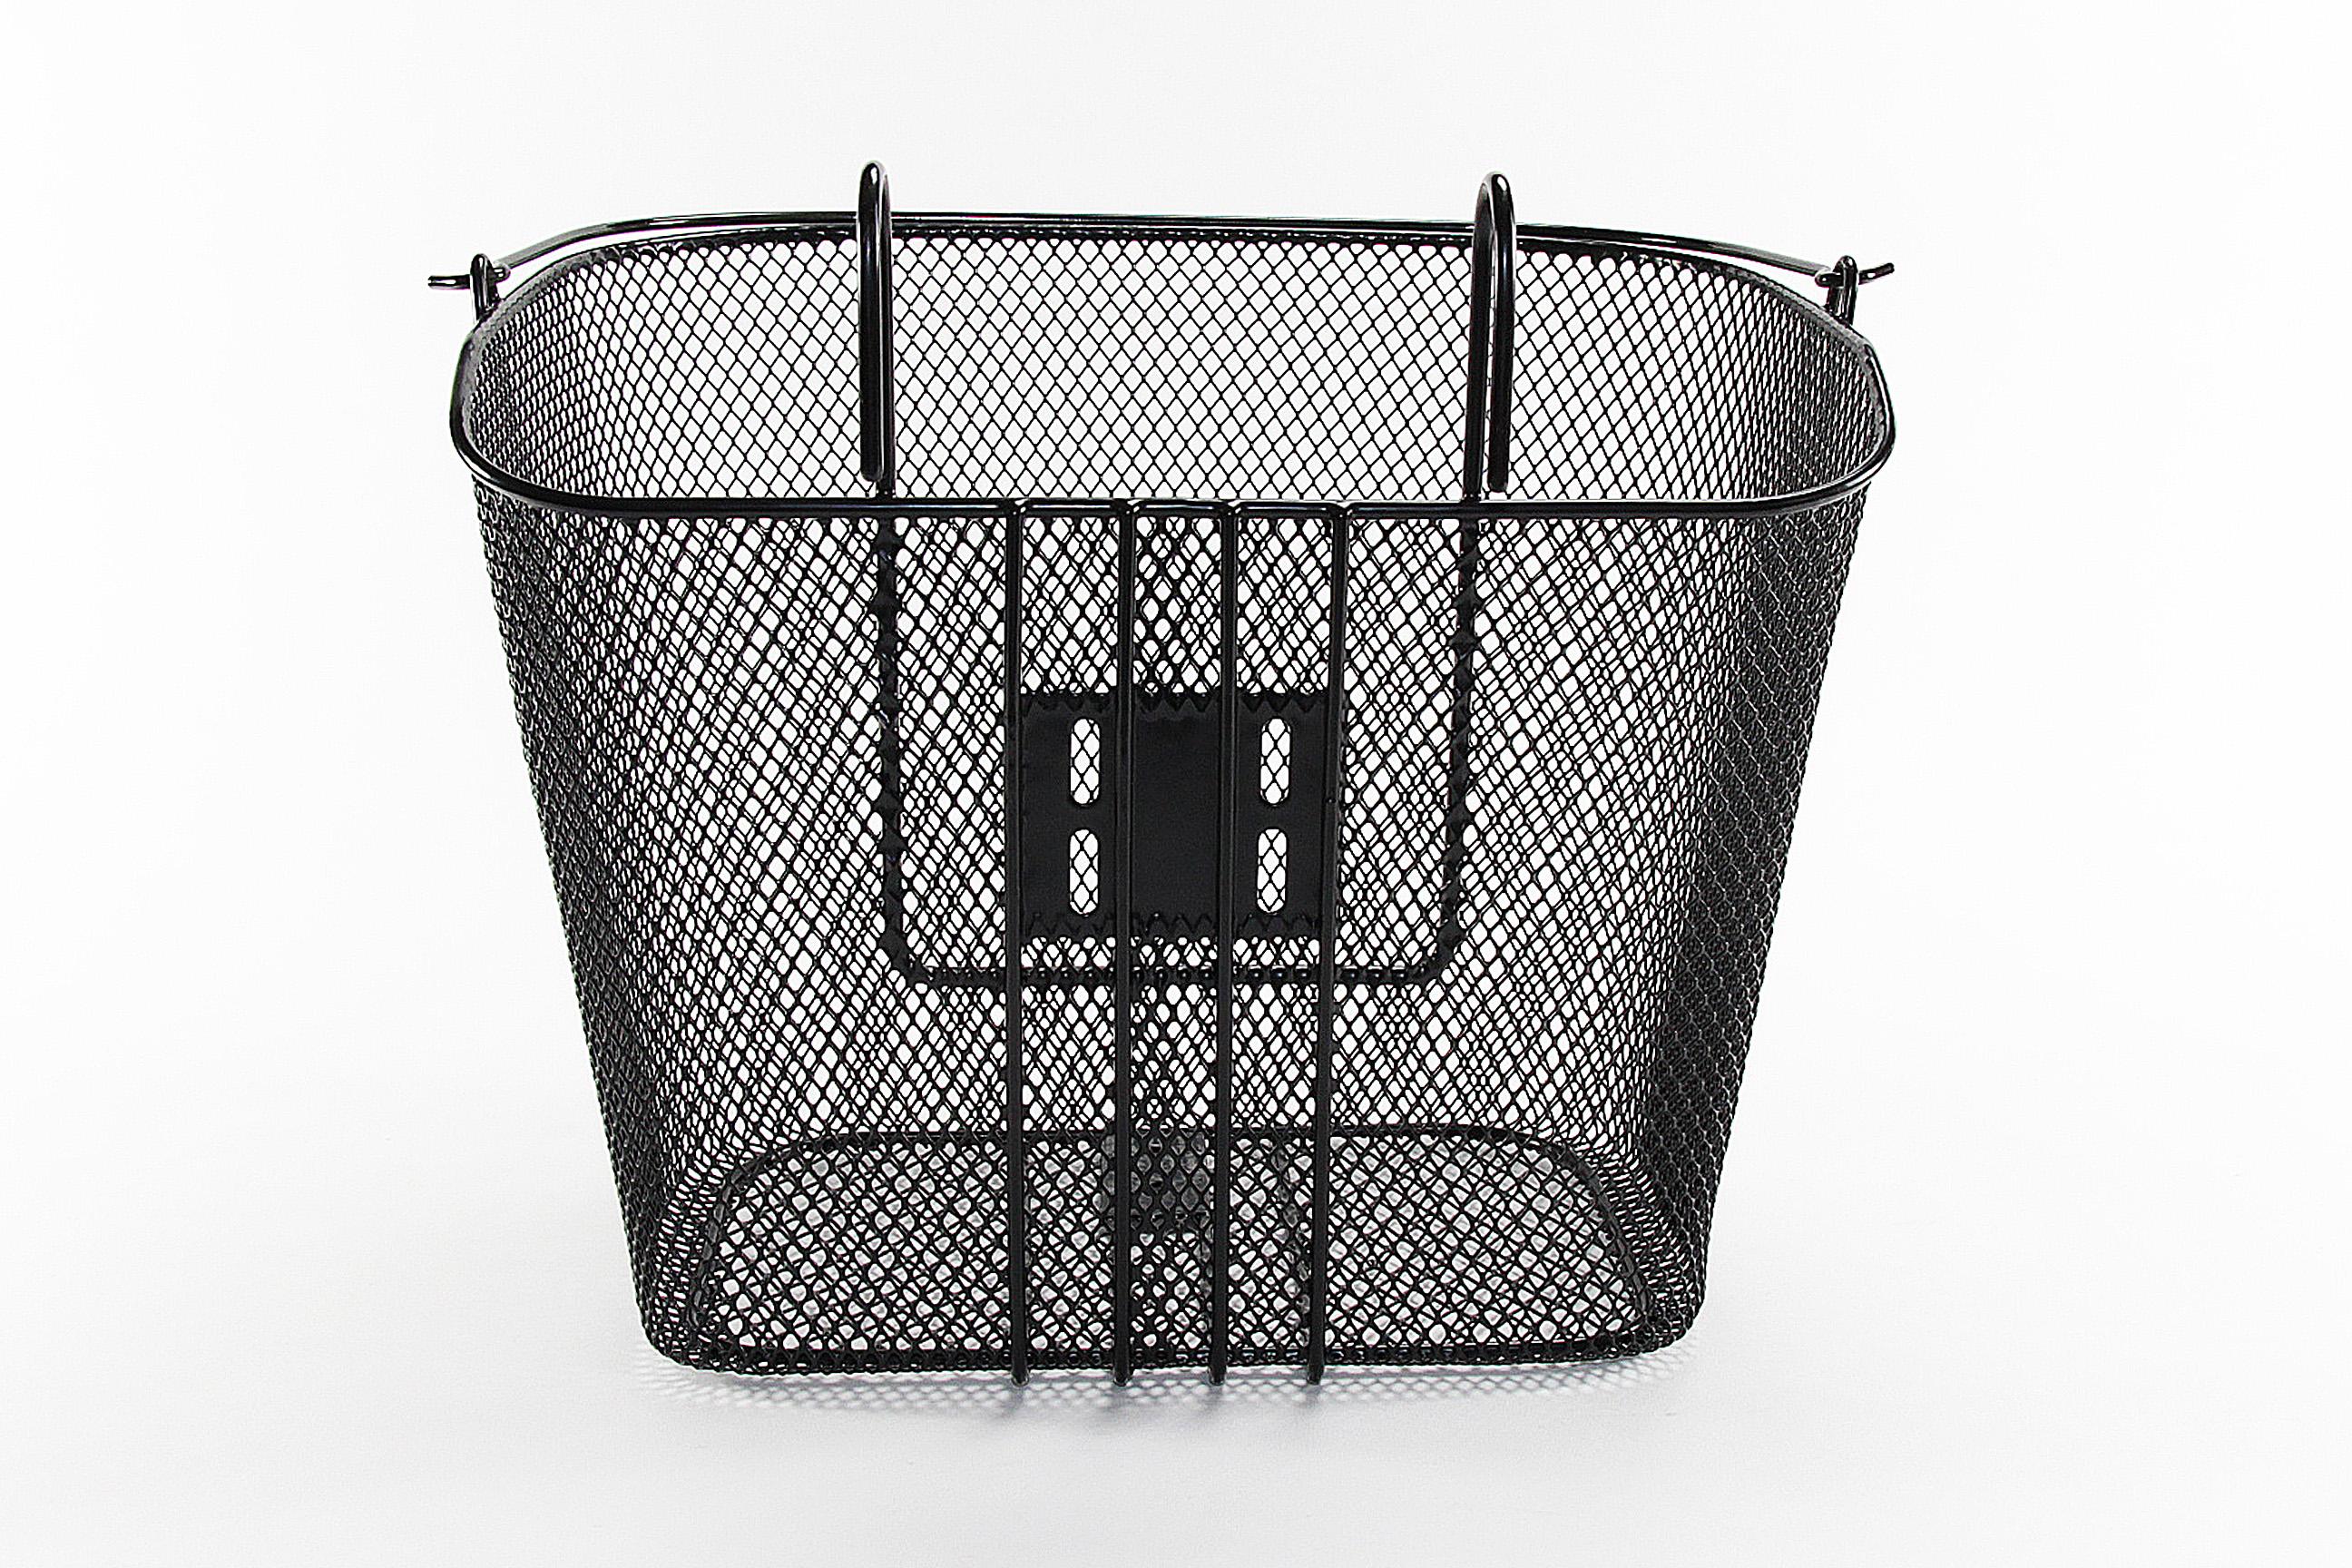 einkaufskorb lenkerkorb fahrradkorb tragekorb korb. Black Bedroom Furniture Sets. Home Design Ideas